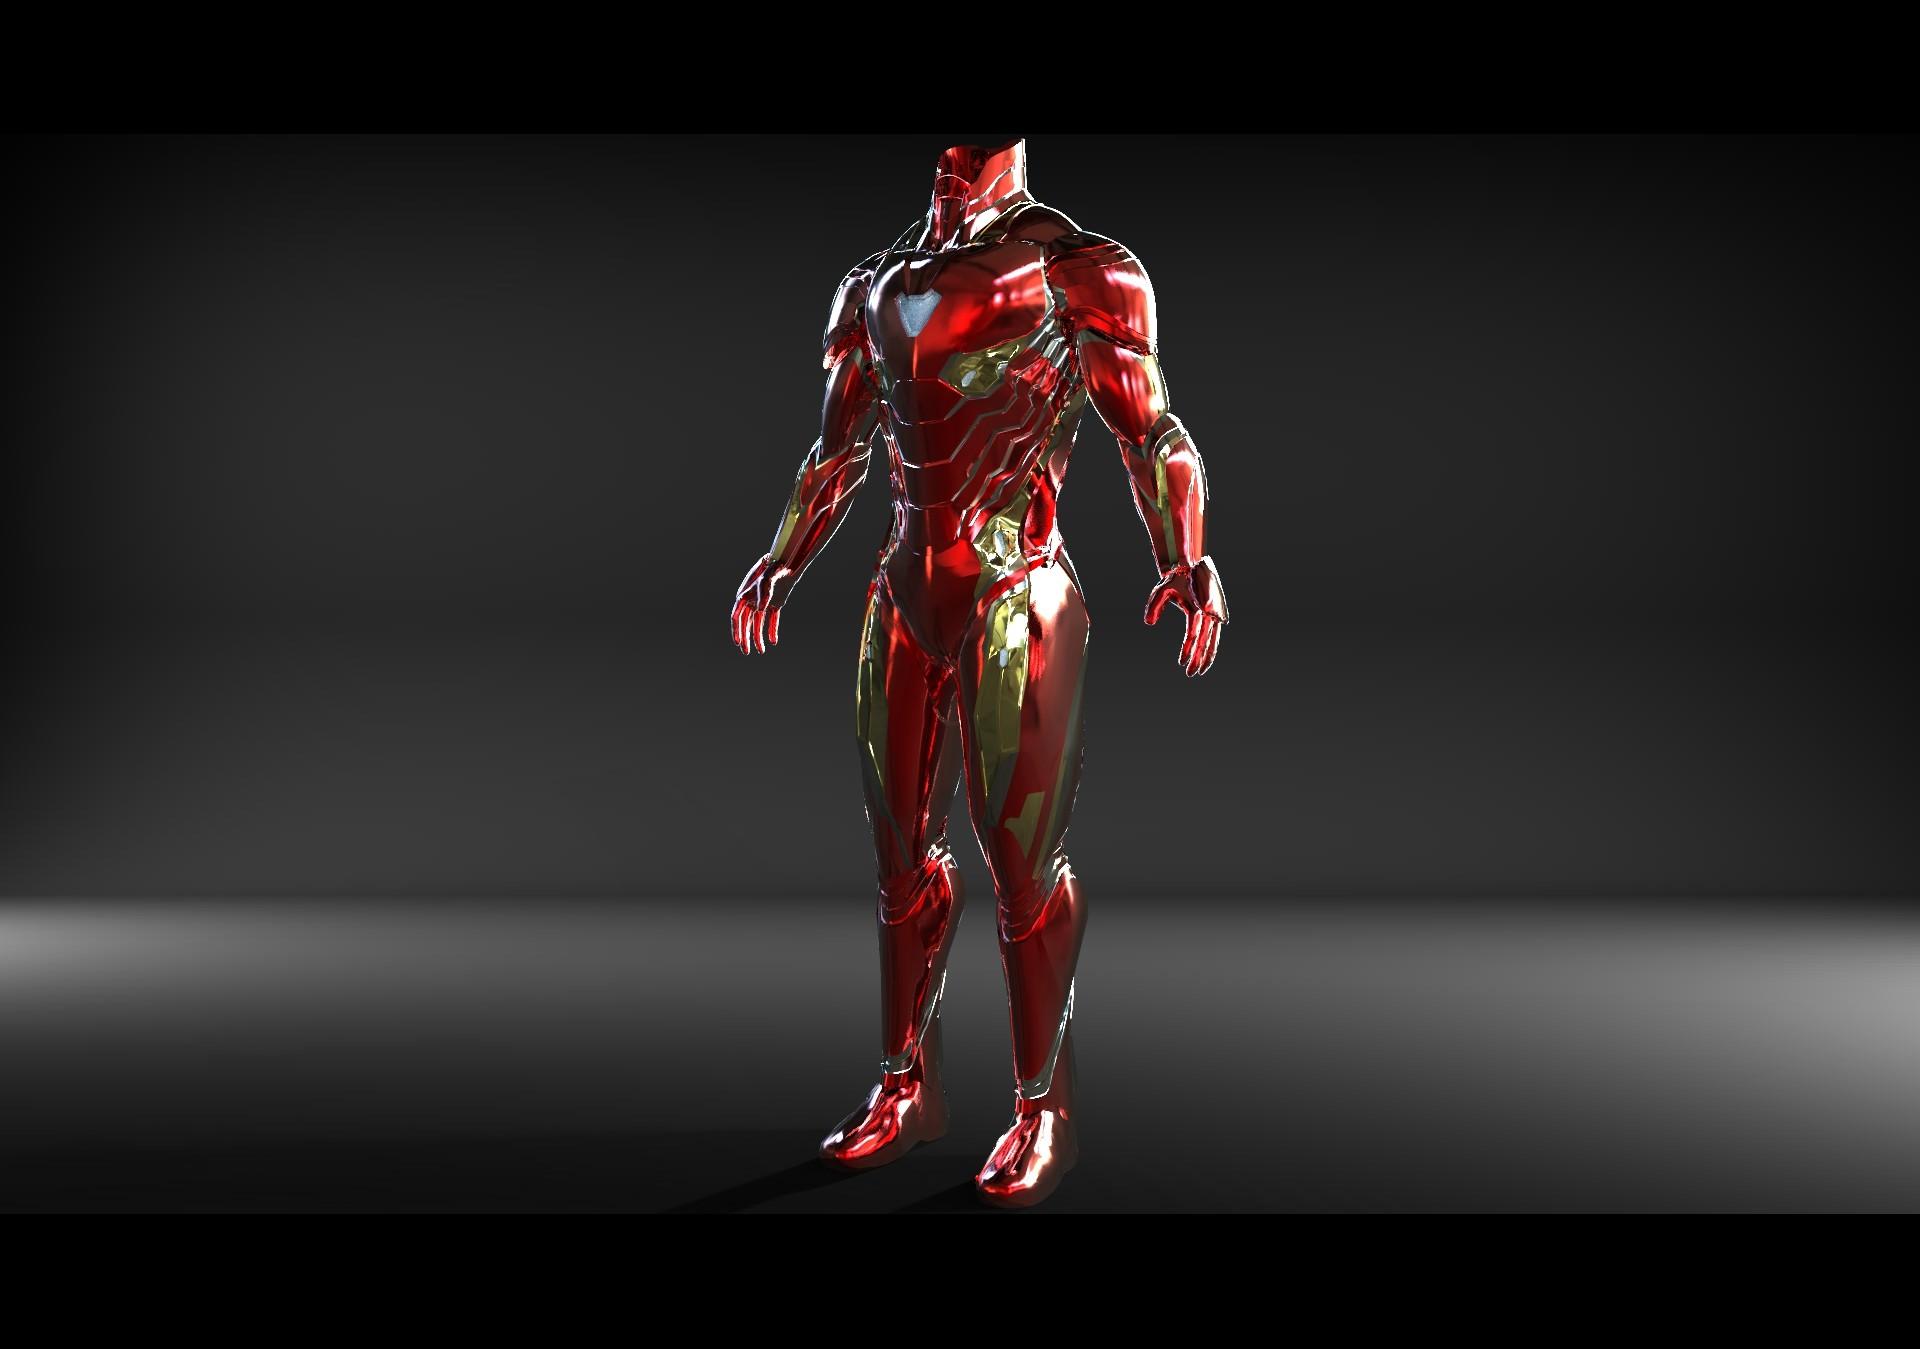 ArtStation - Iron Man Mark 50 (Infinity War) 3D Model